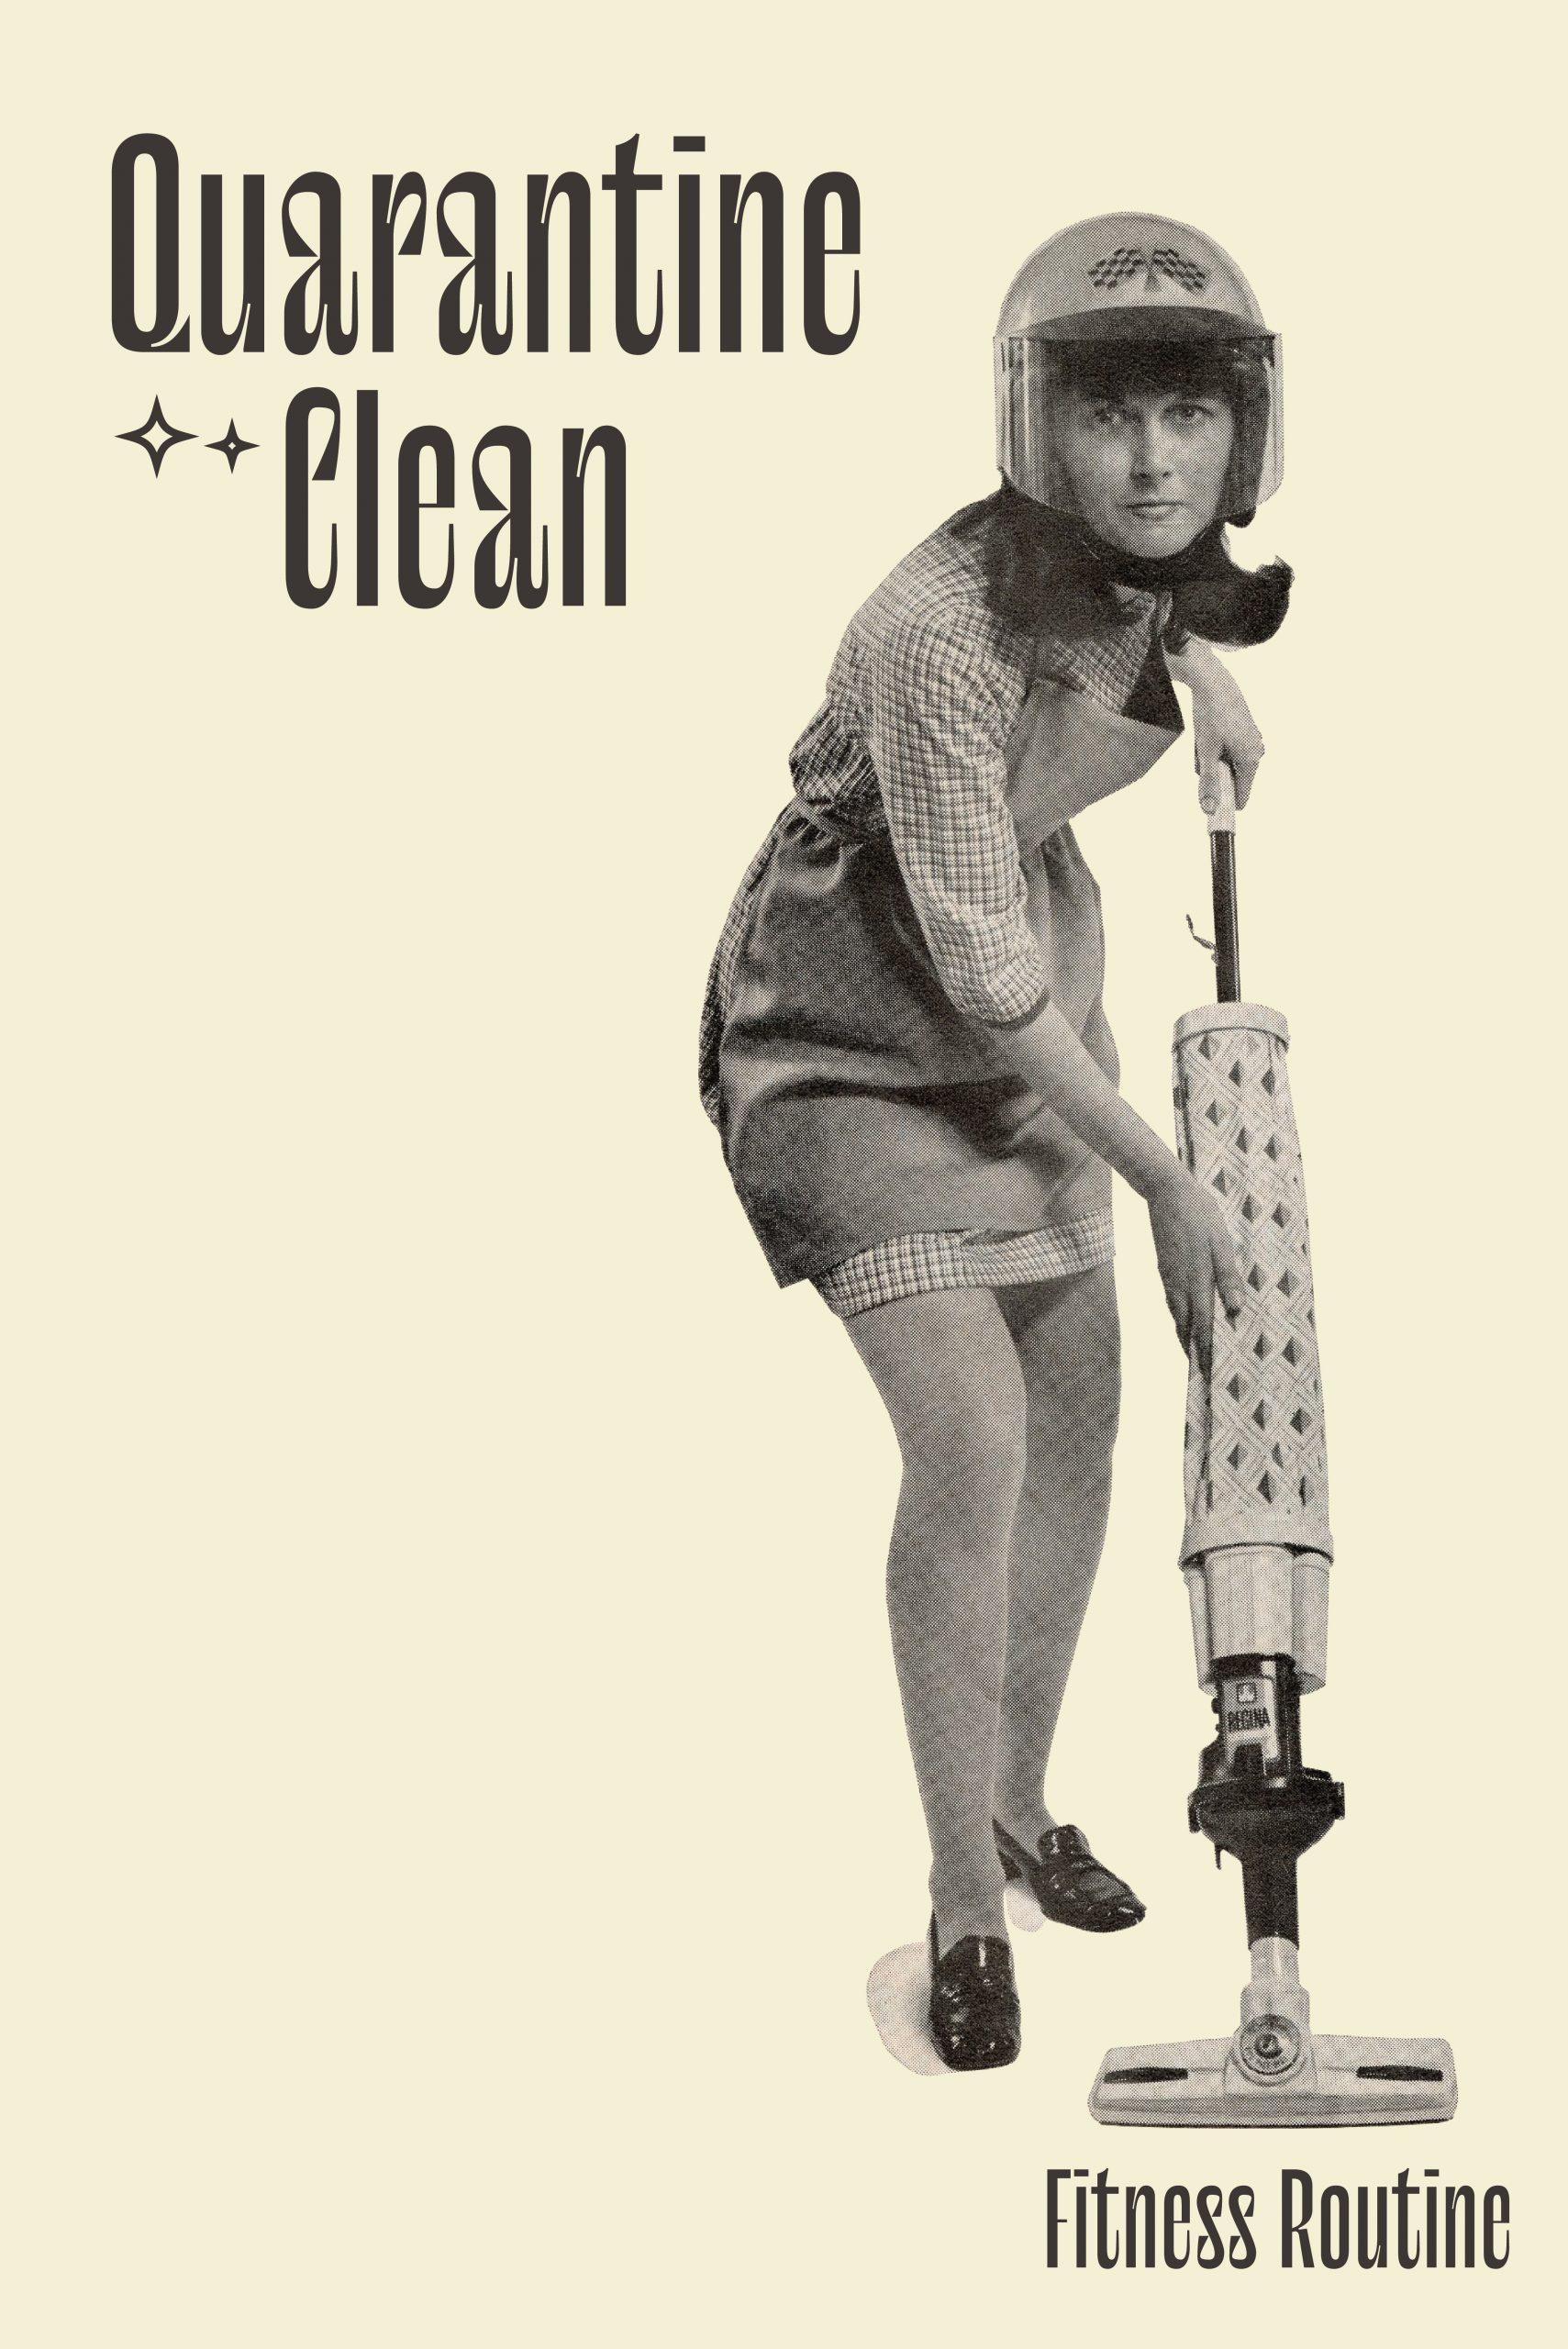 Clean Routine